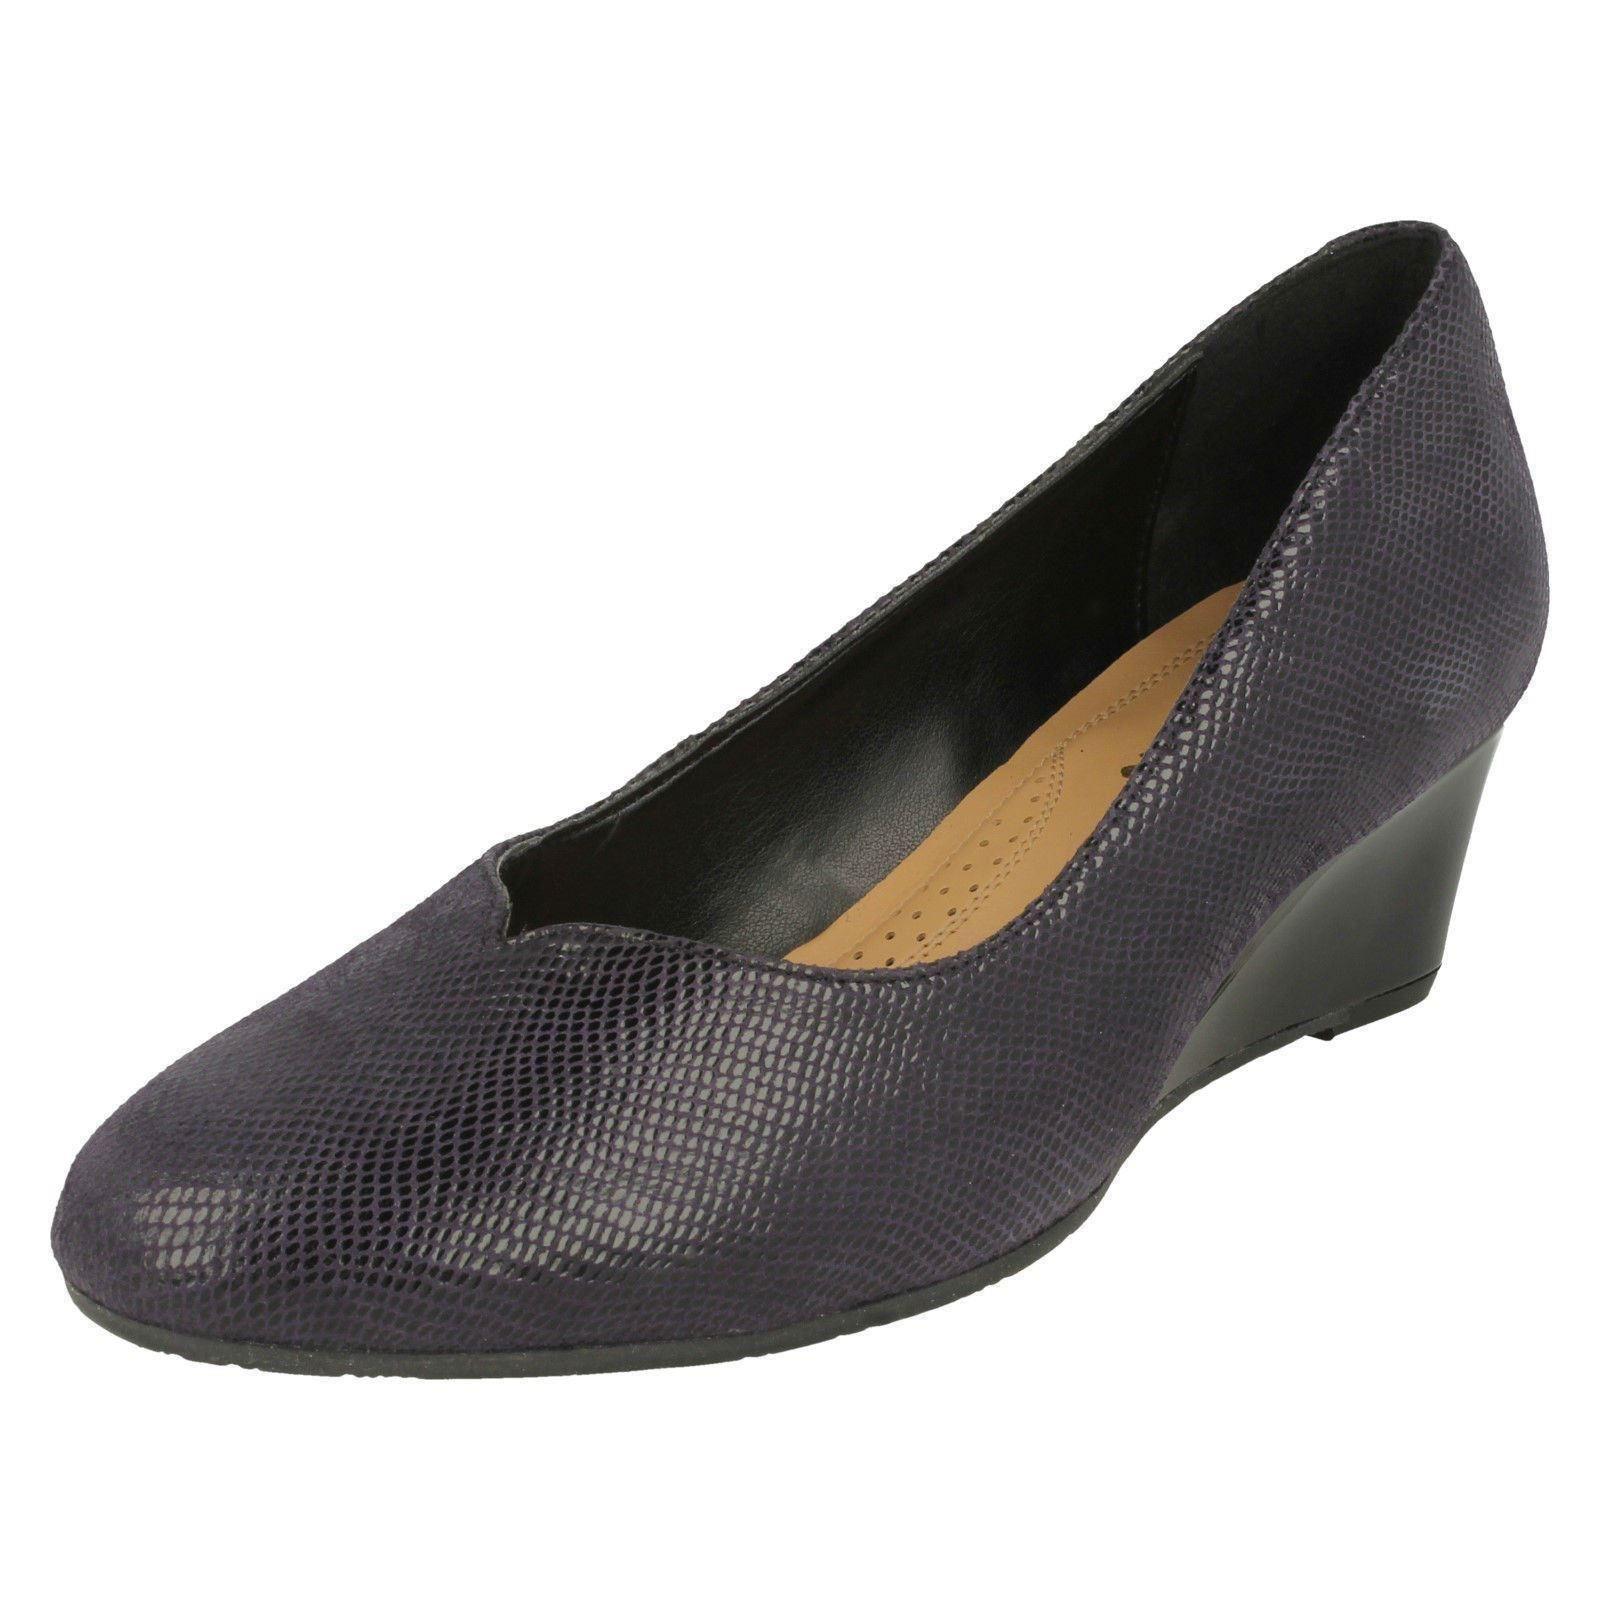 van dal hanover shoes